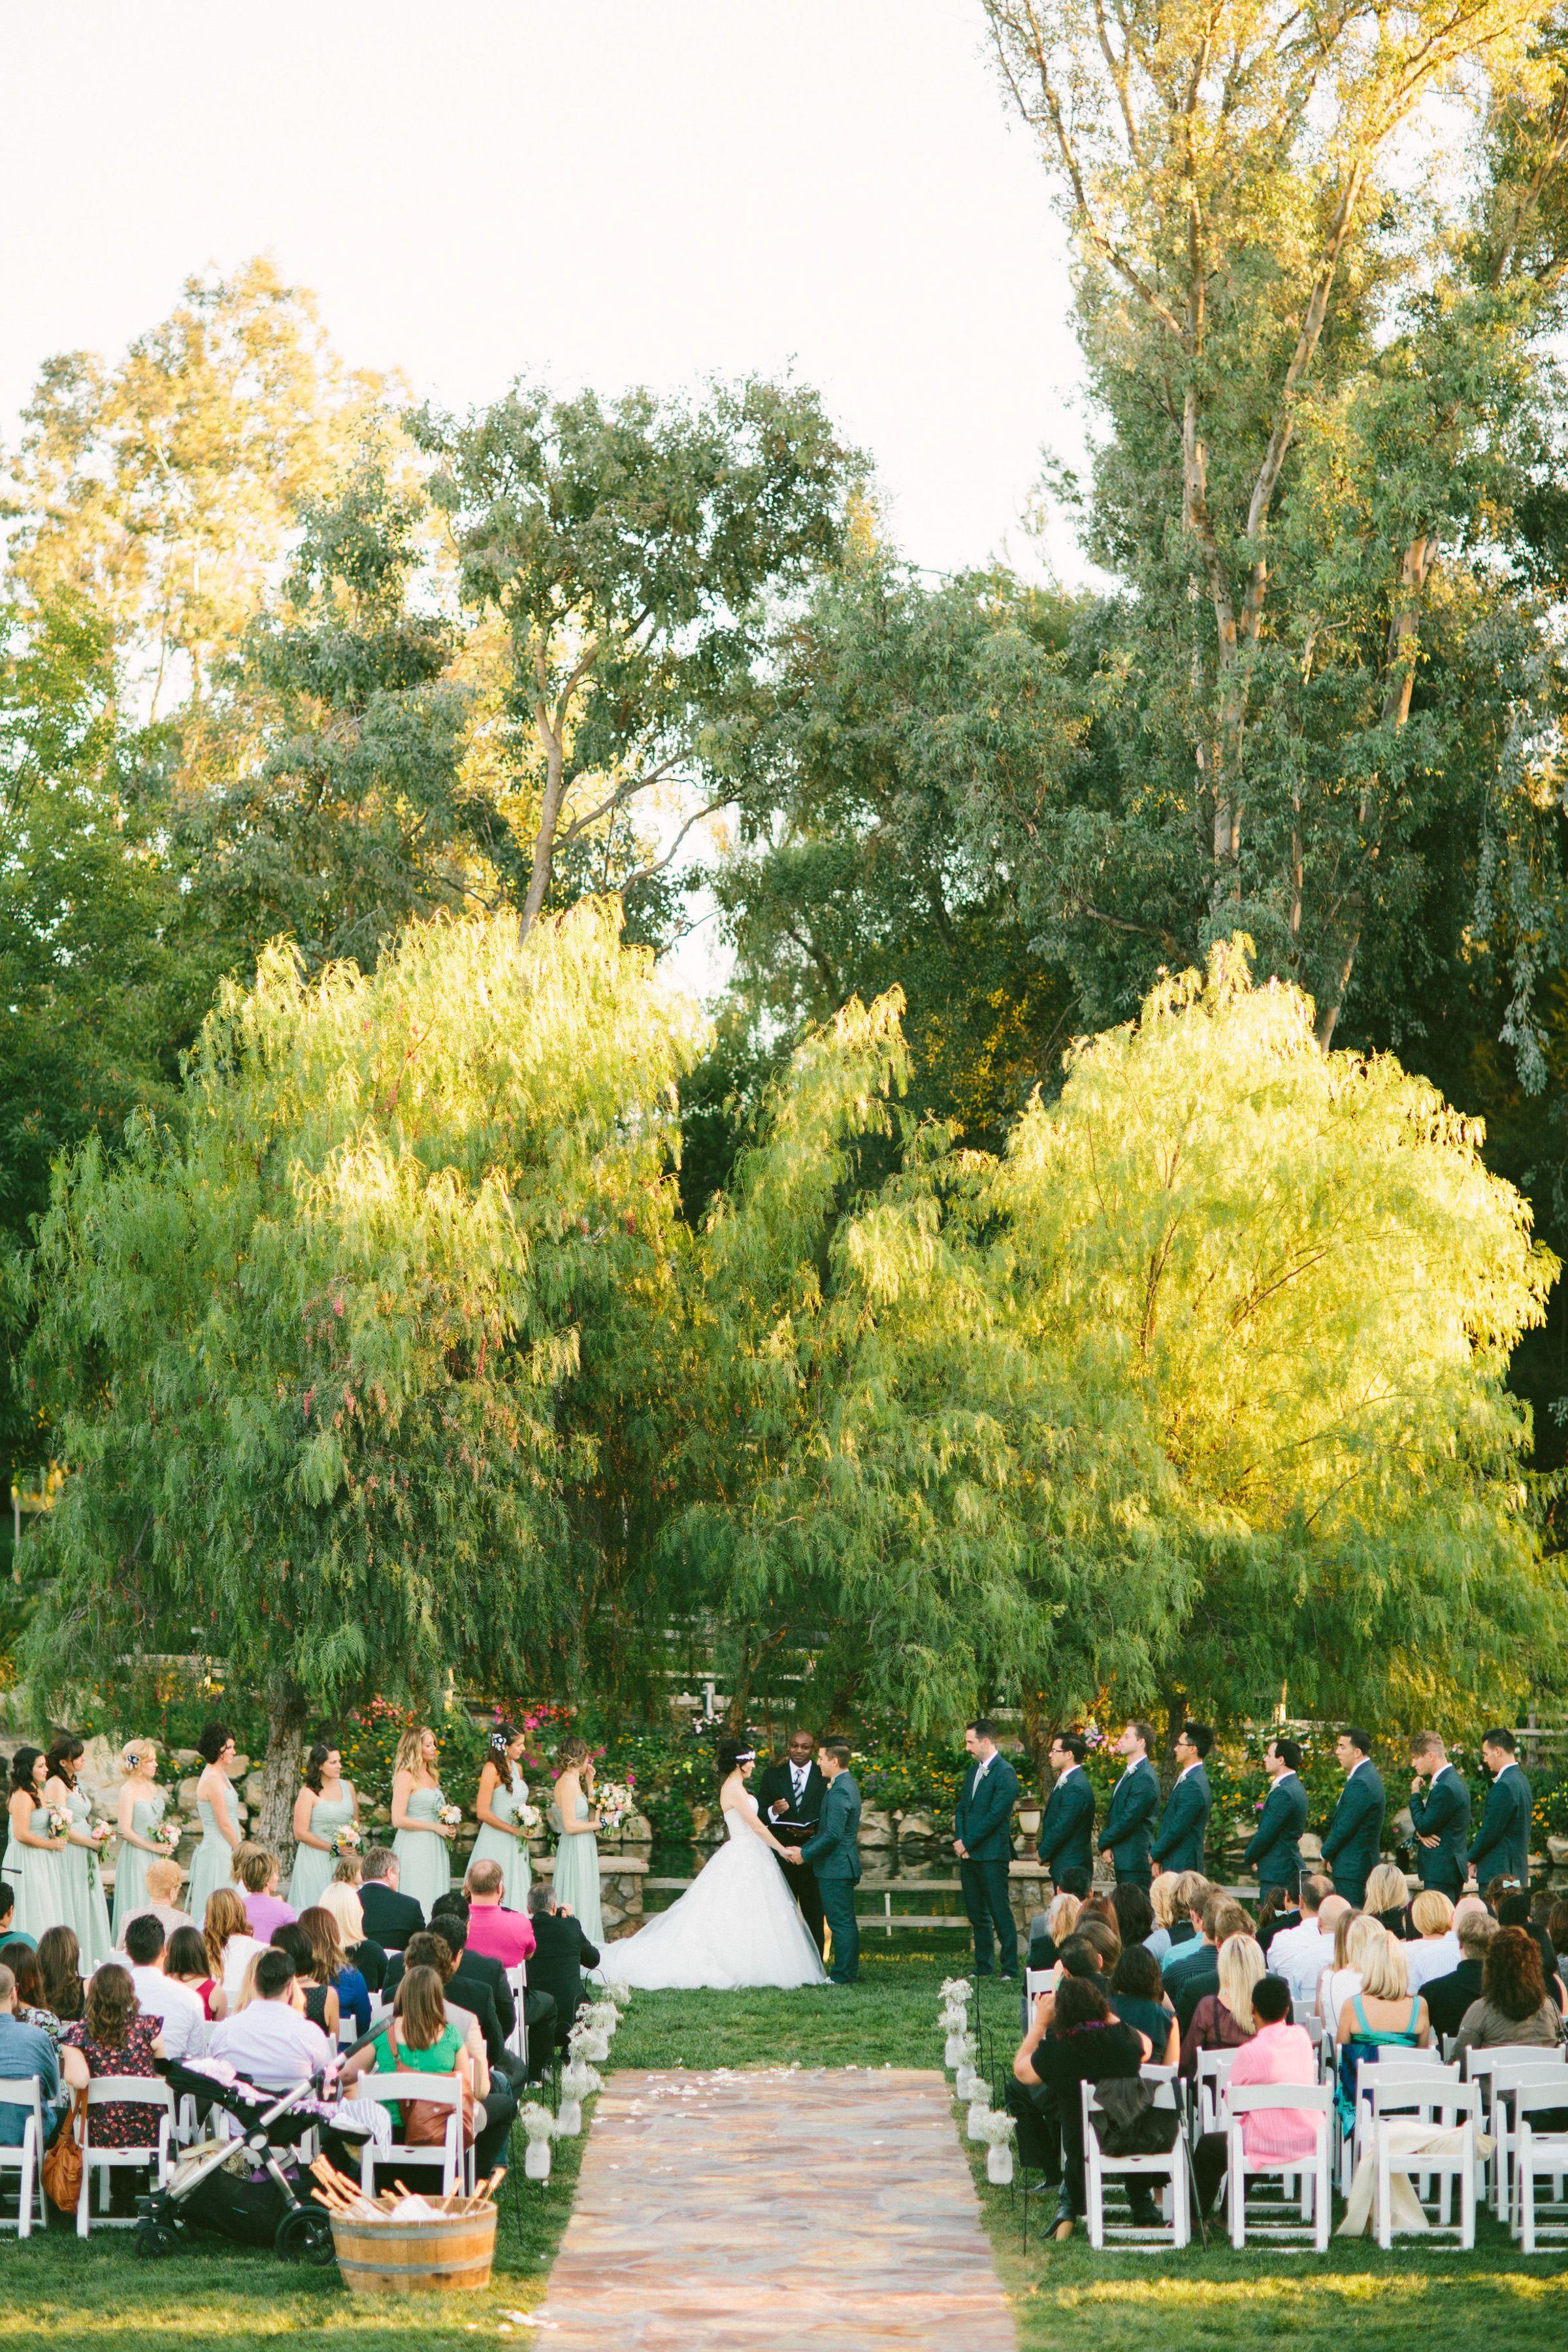 Diy Vineyard Wedding In Temecula